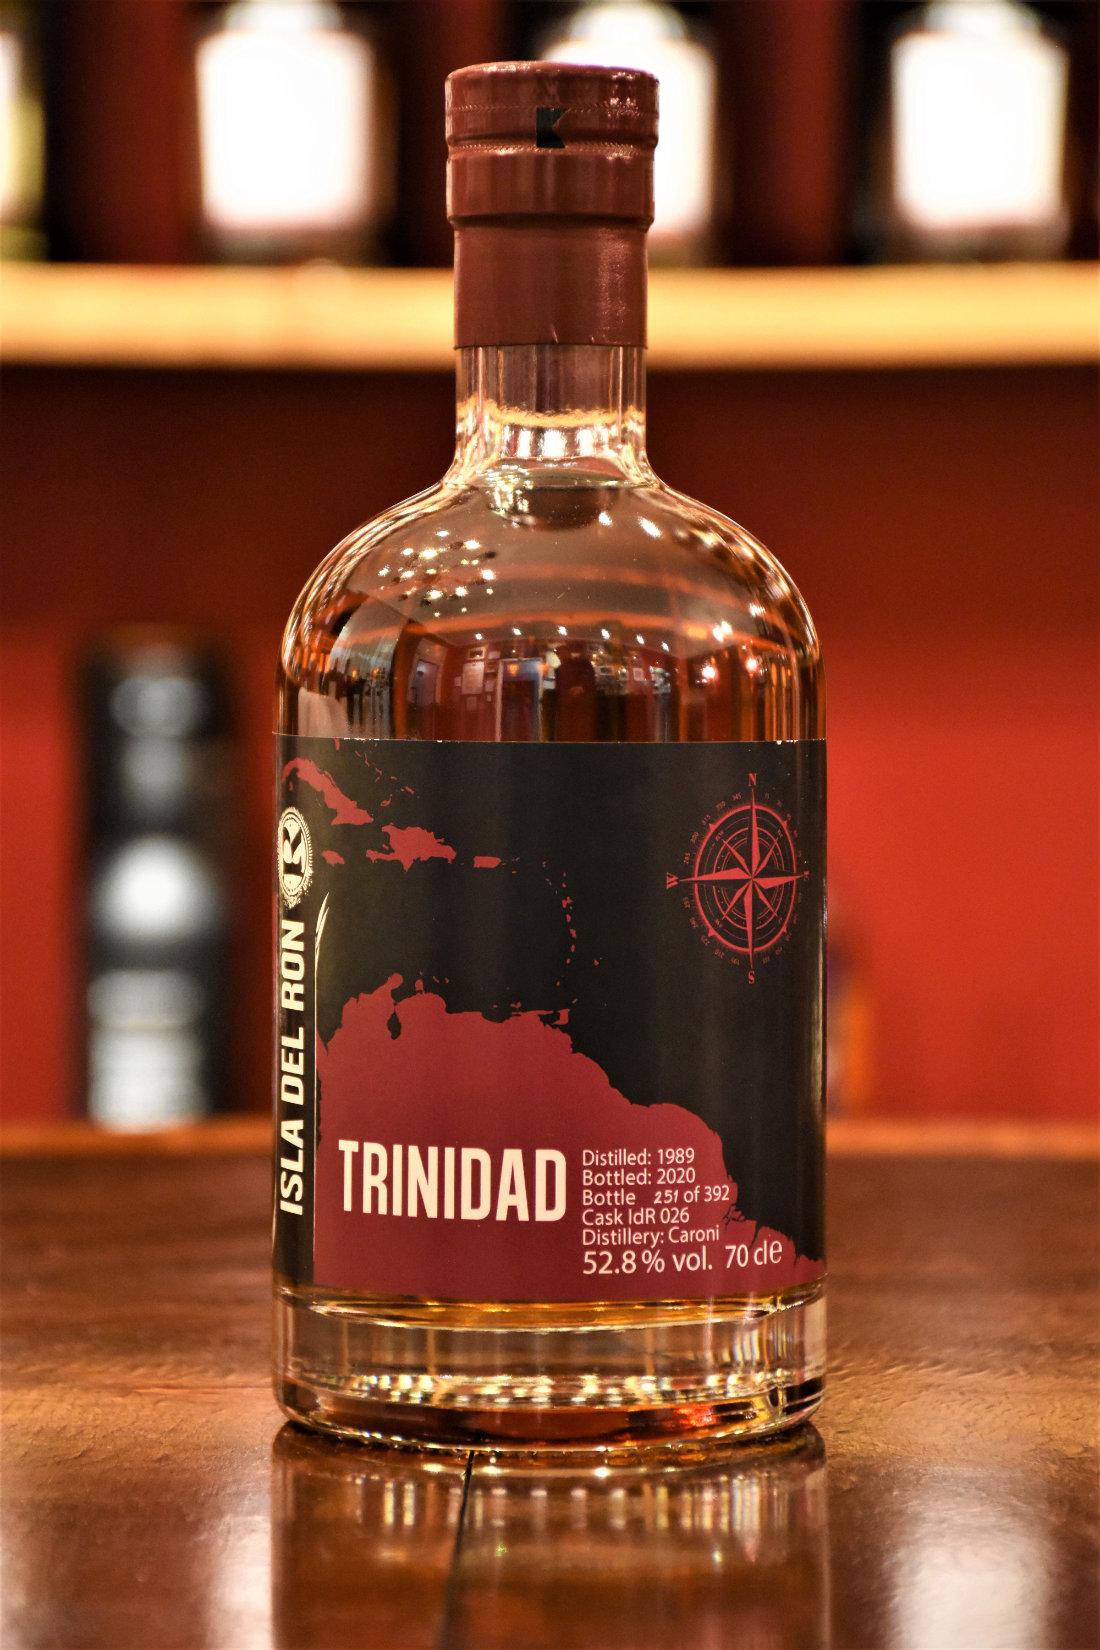 Isla del Ron Trinidad 1989, 31 y.o. - Sherry Butt Finish, 52,8% Alc.Vol., Malts of Scotland